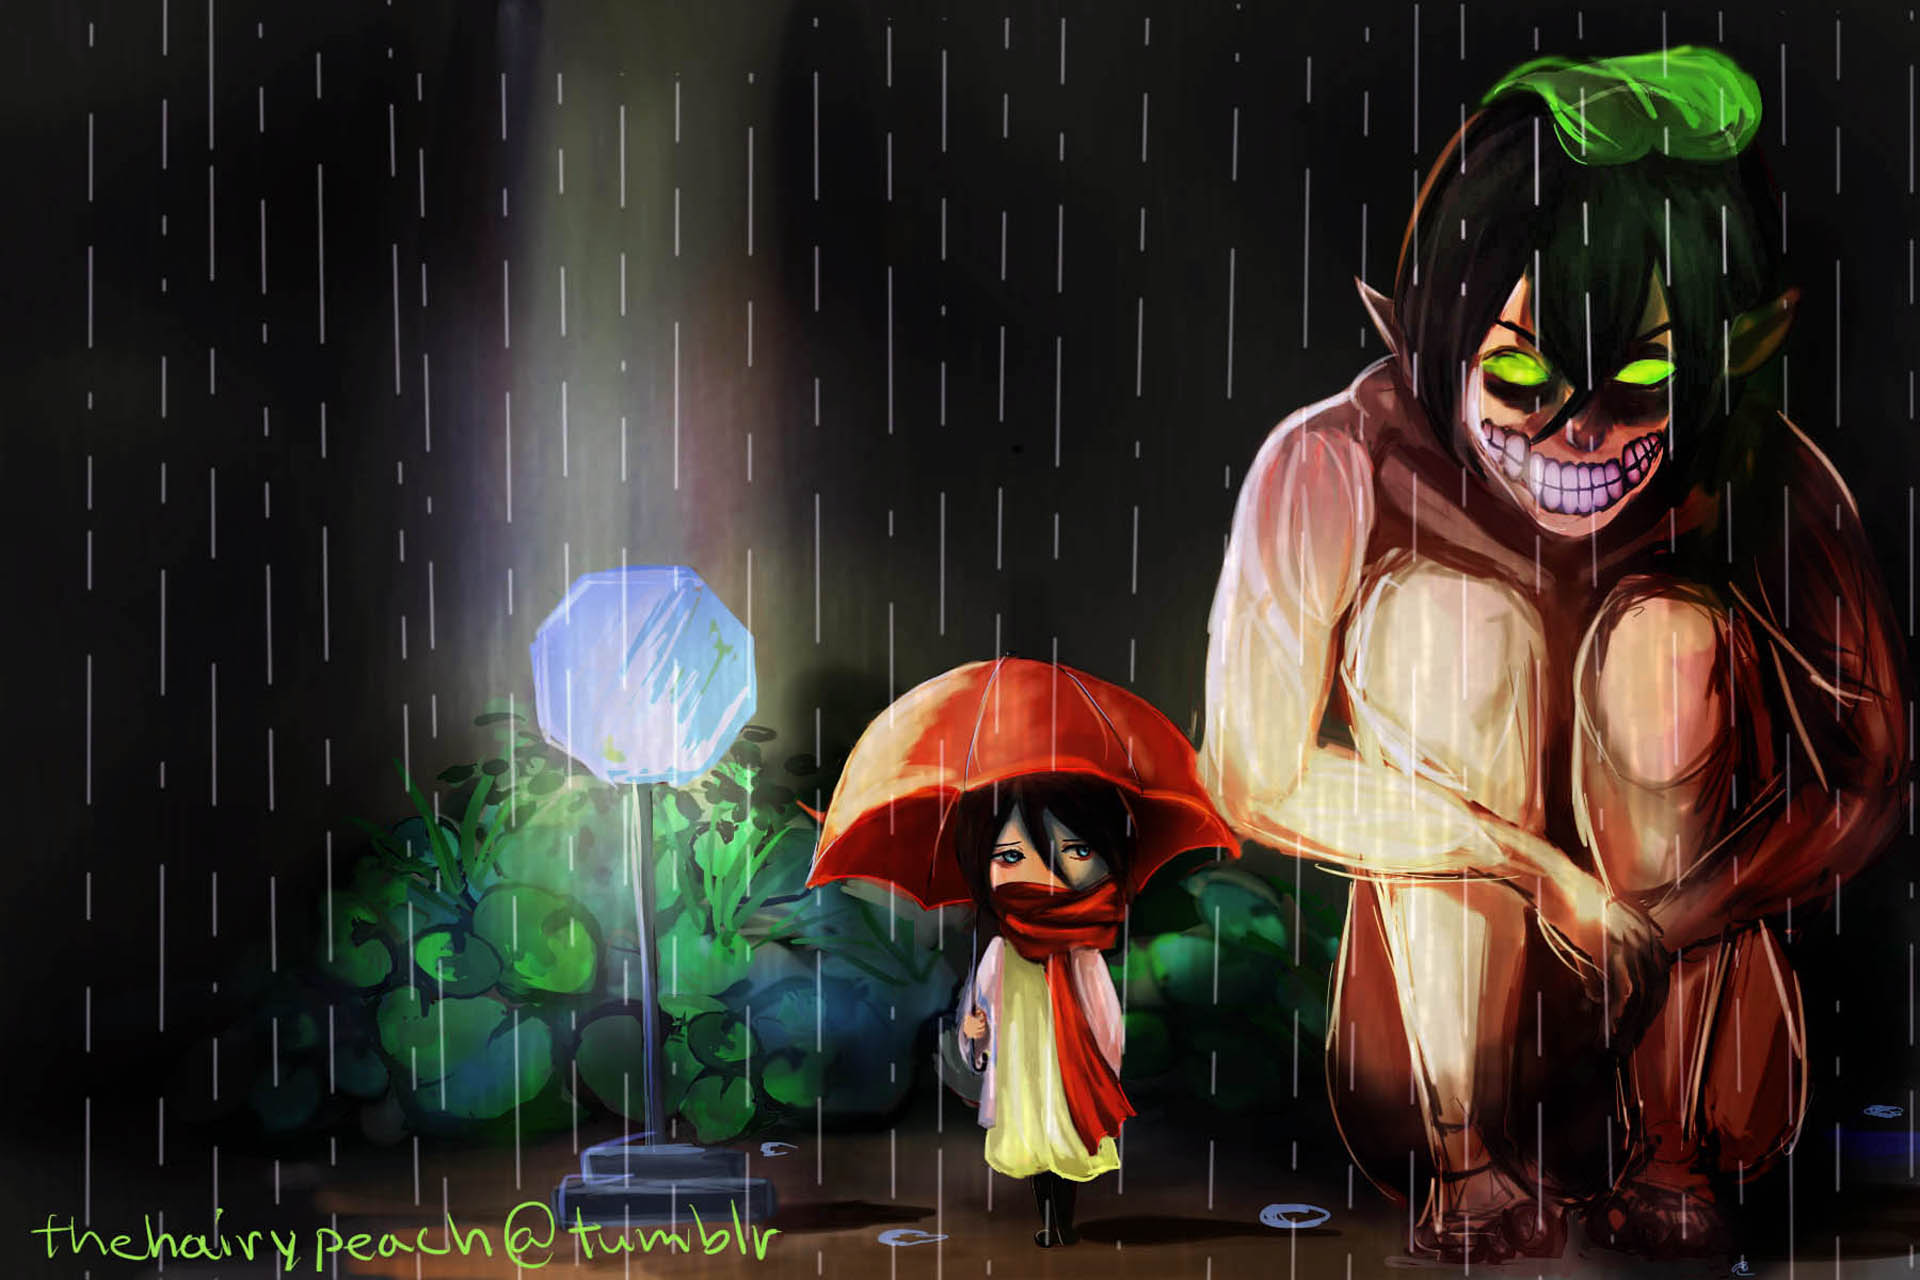 http://4.bp.blogspot.com/-RDzQlLADqCA/UiK4lWBjcZI/AAAAAAAAIJ0/kuGivJGTThk/s2560/cute+eren+titan+form+mikasa+ackerman+Attack+on+Titan+Shingeki+no+Kyojin+raining+anime+hd+wallpaper+for+desktop.jpg